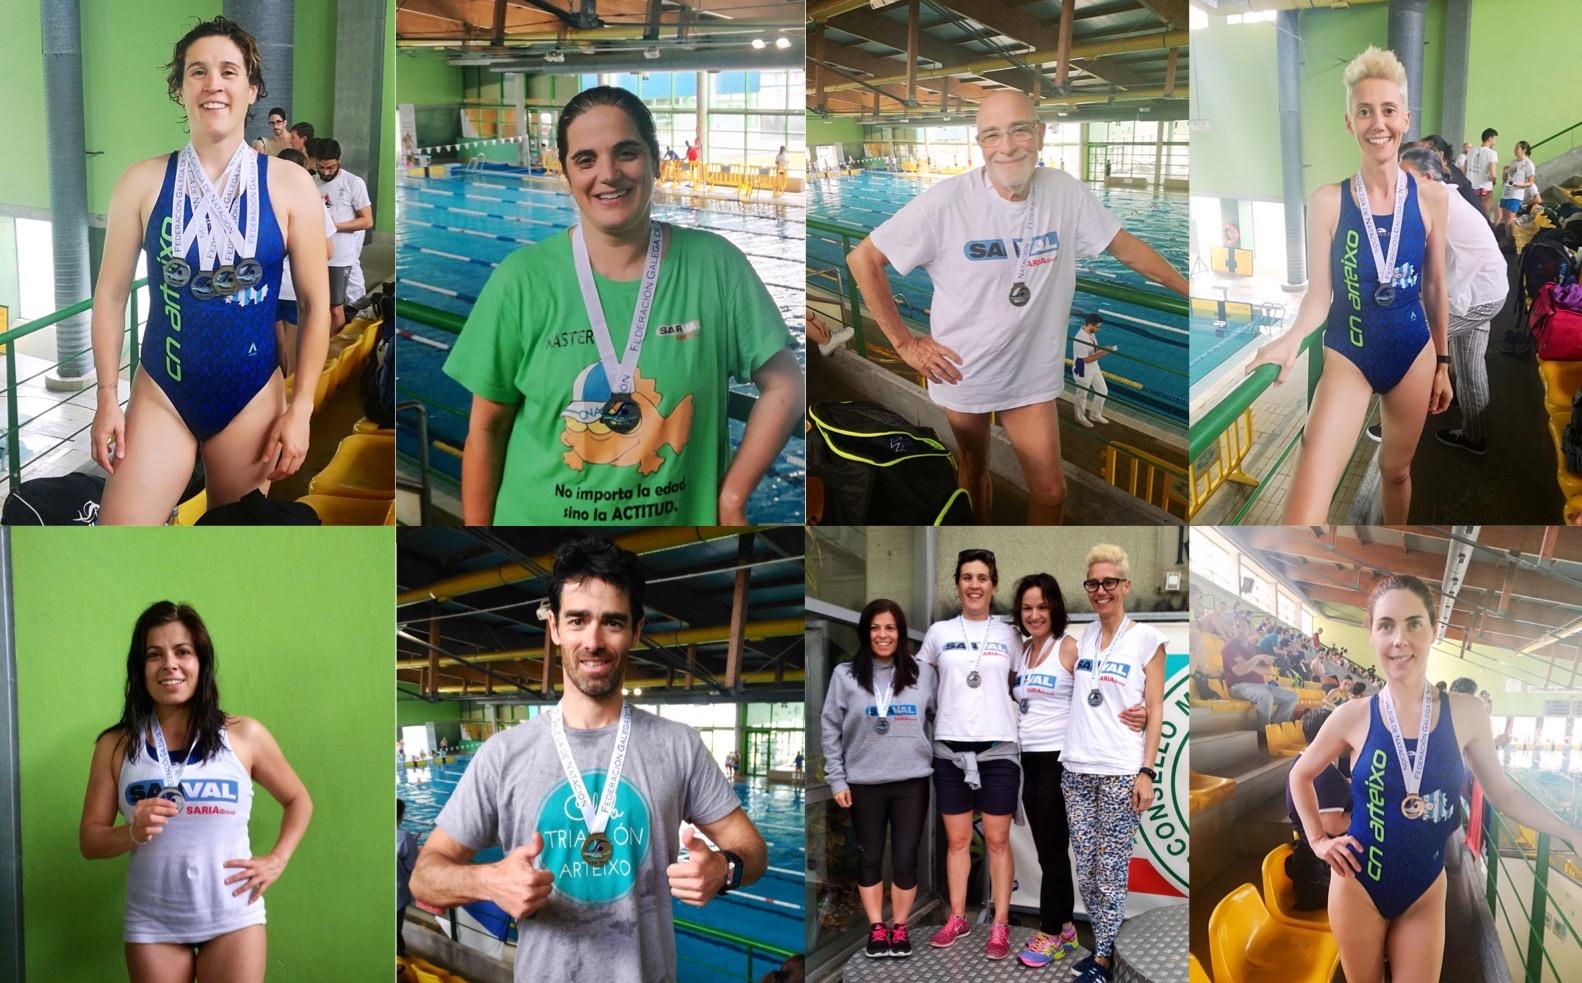 Campionato galego m ster resultados club nataci n arteixo for Piscina arteixo